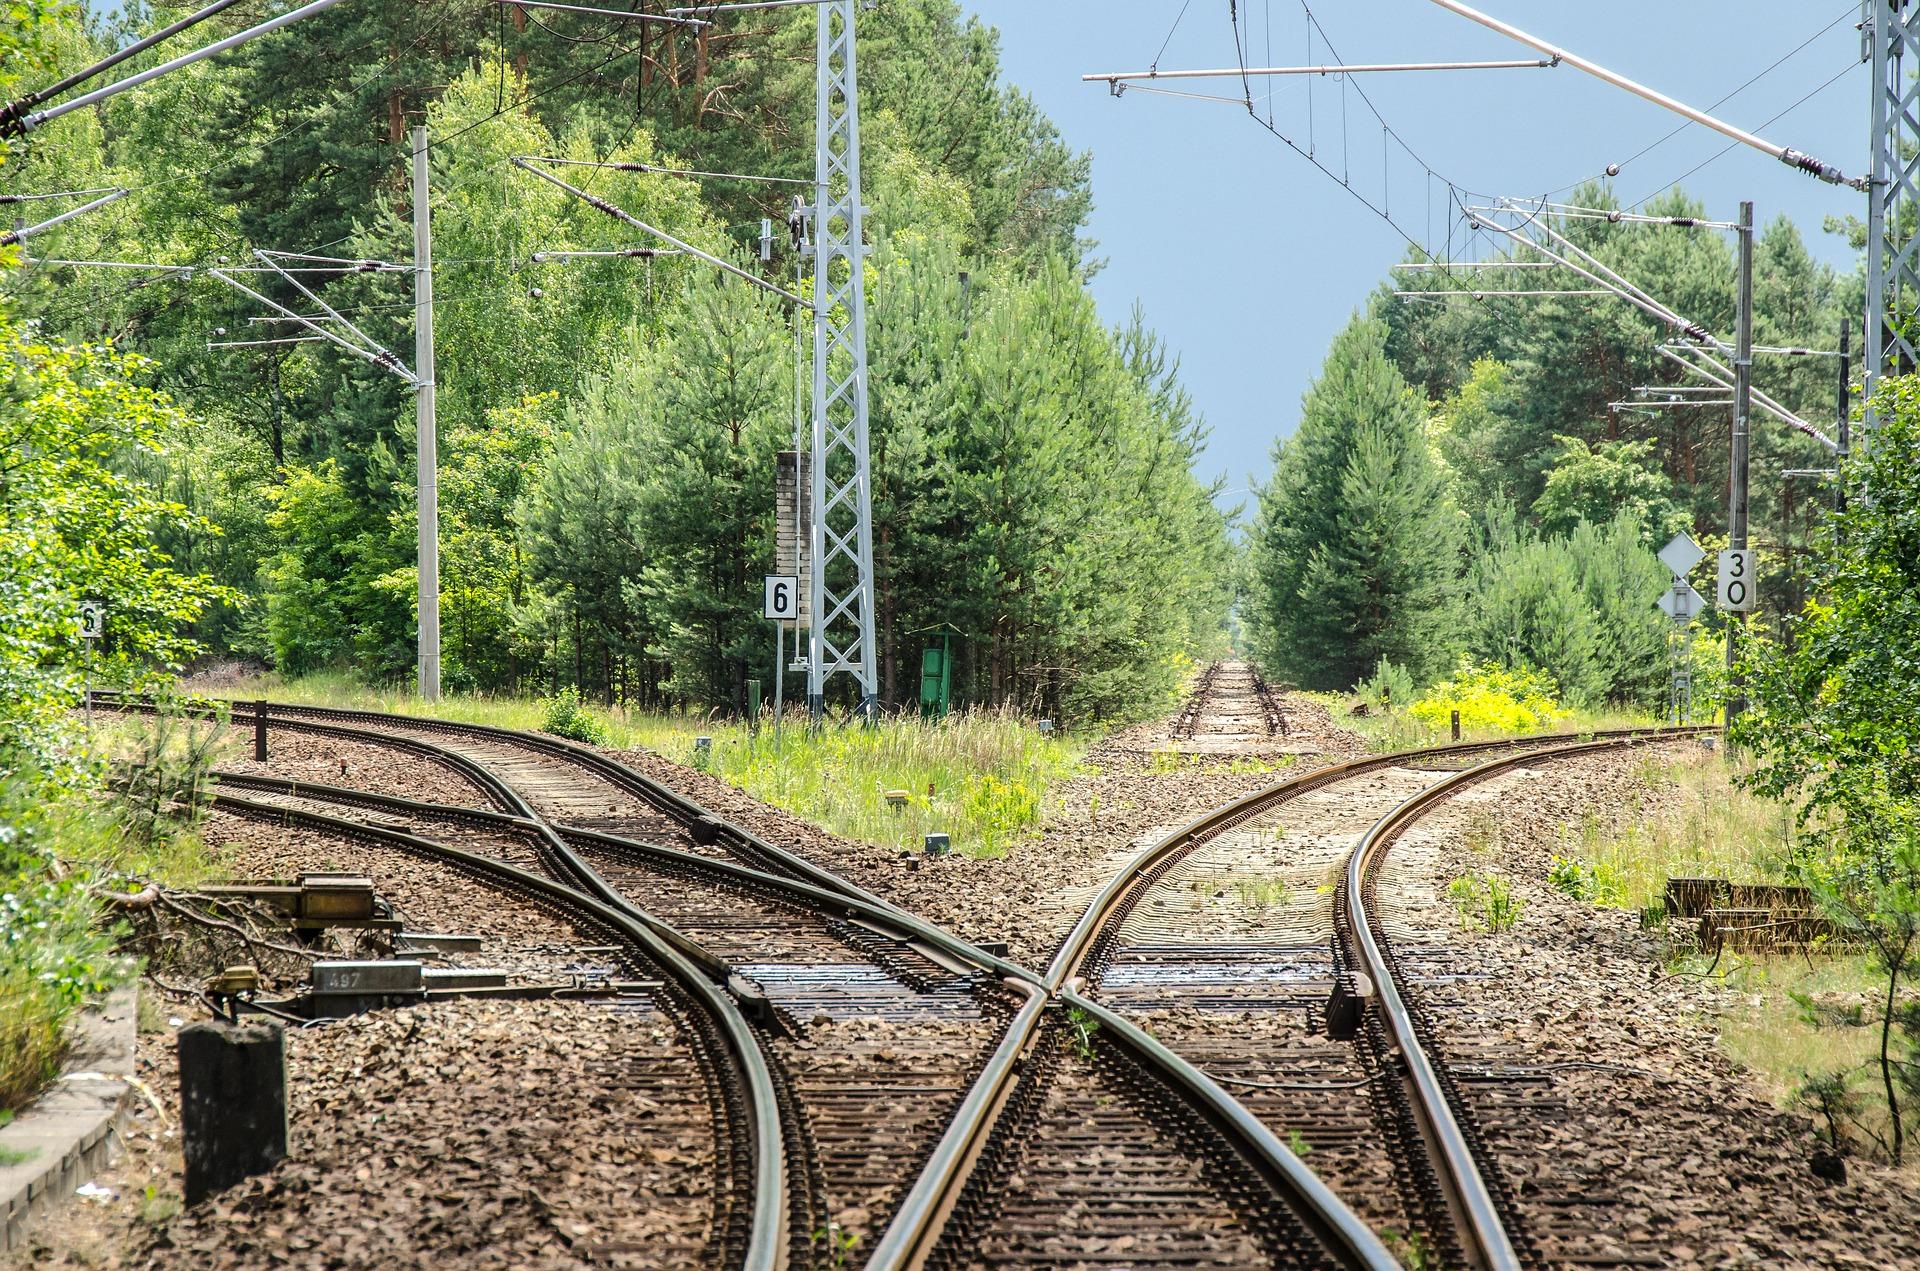 railway-2100353_1920.jpg